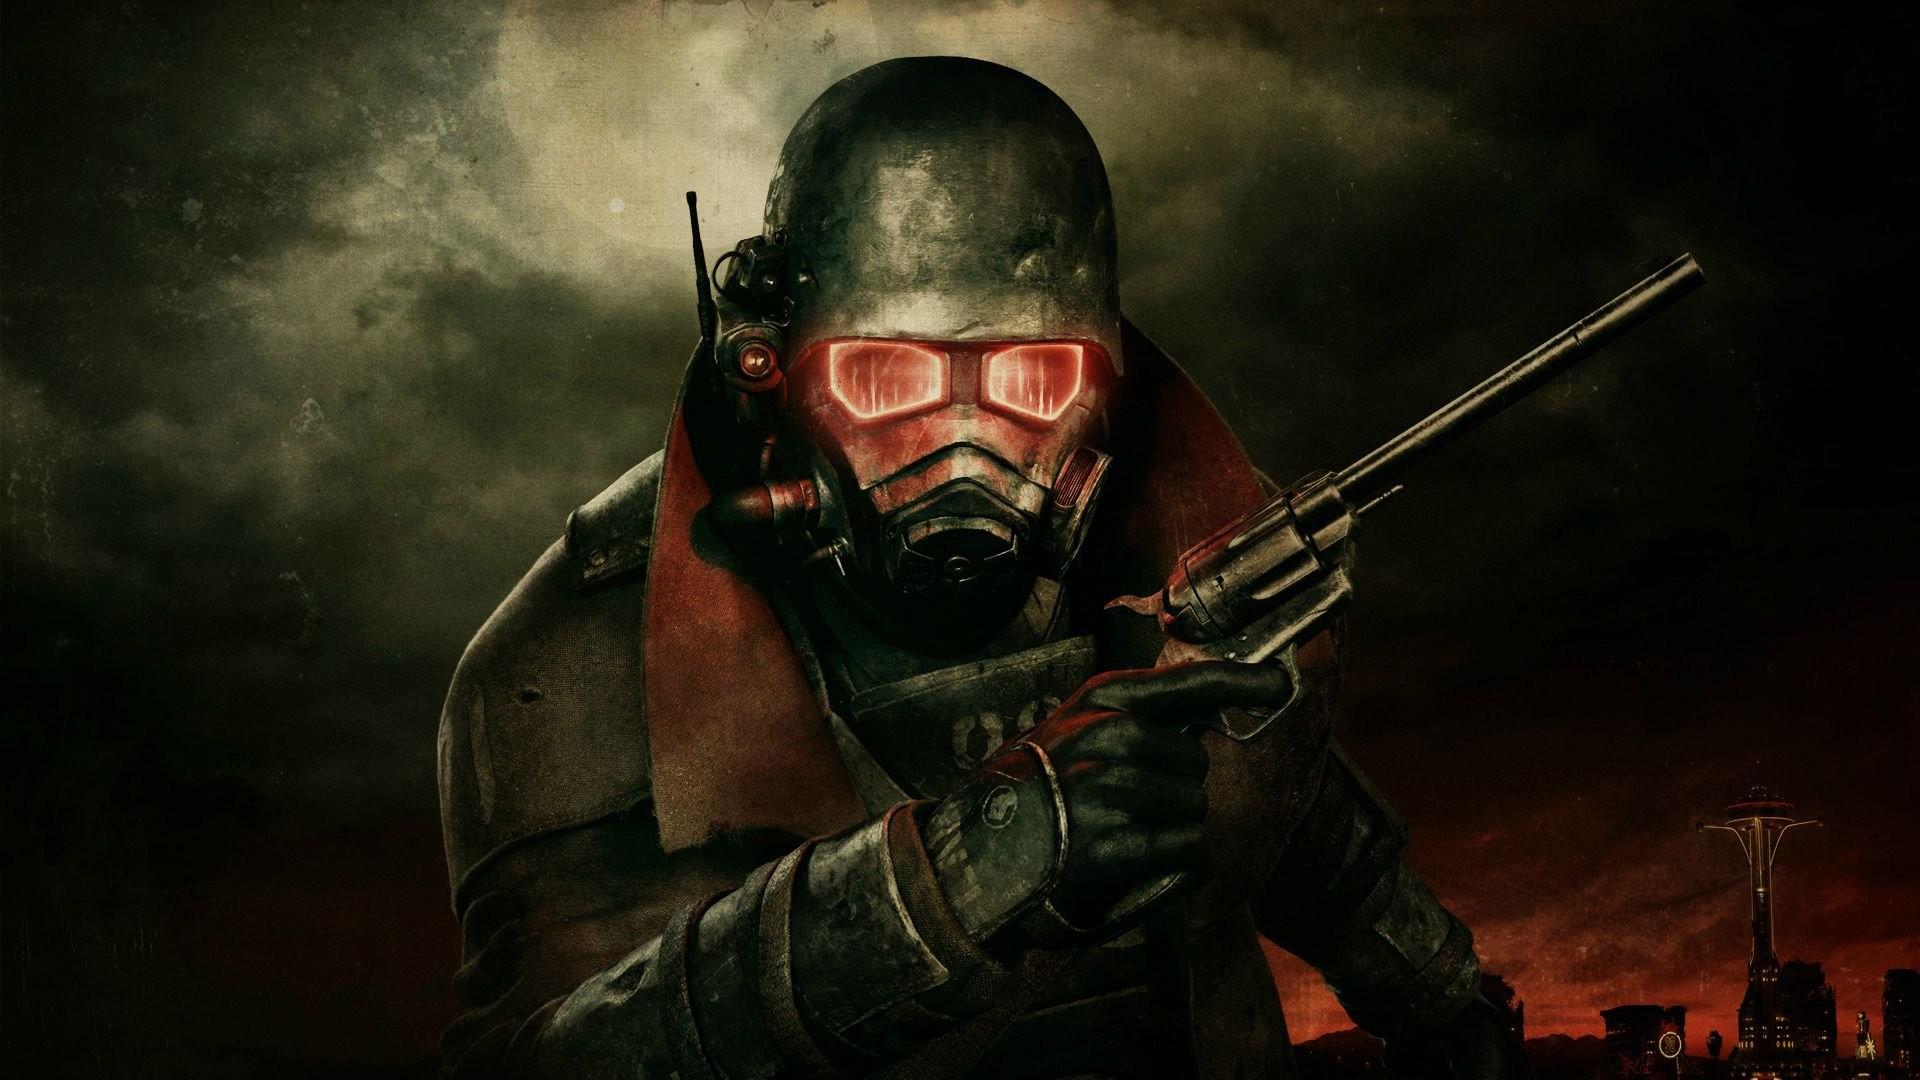 Fallout New Vegas HD Wallpapers 1080p by Ervin Kimble #2